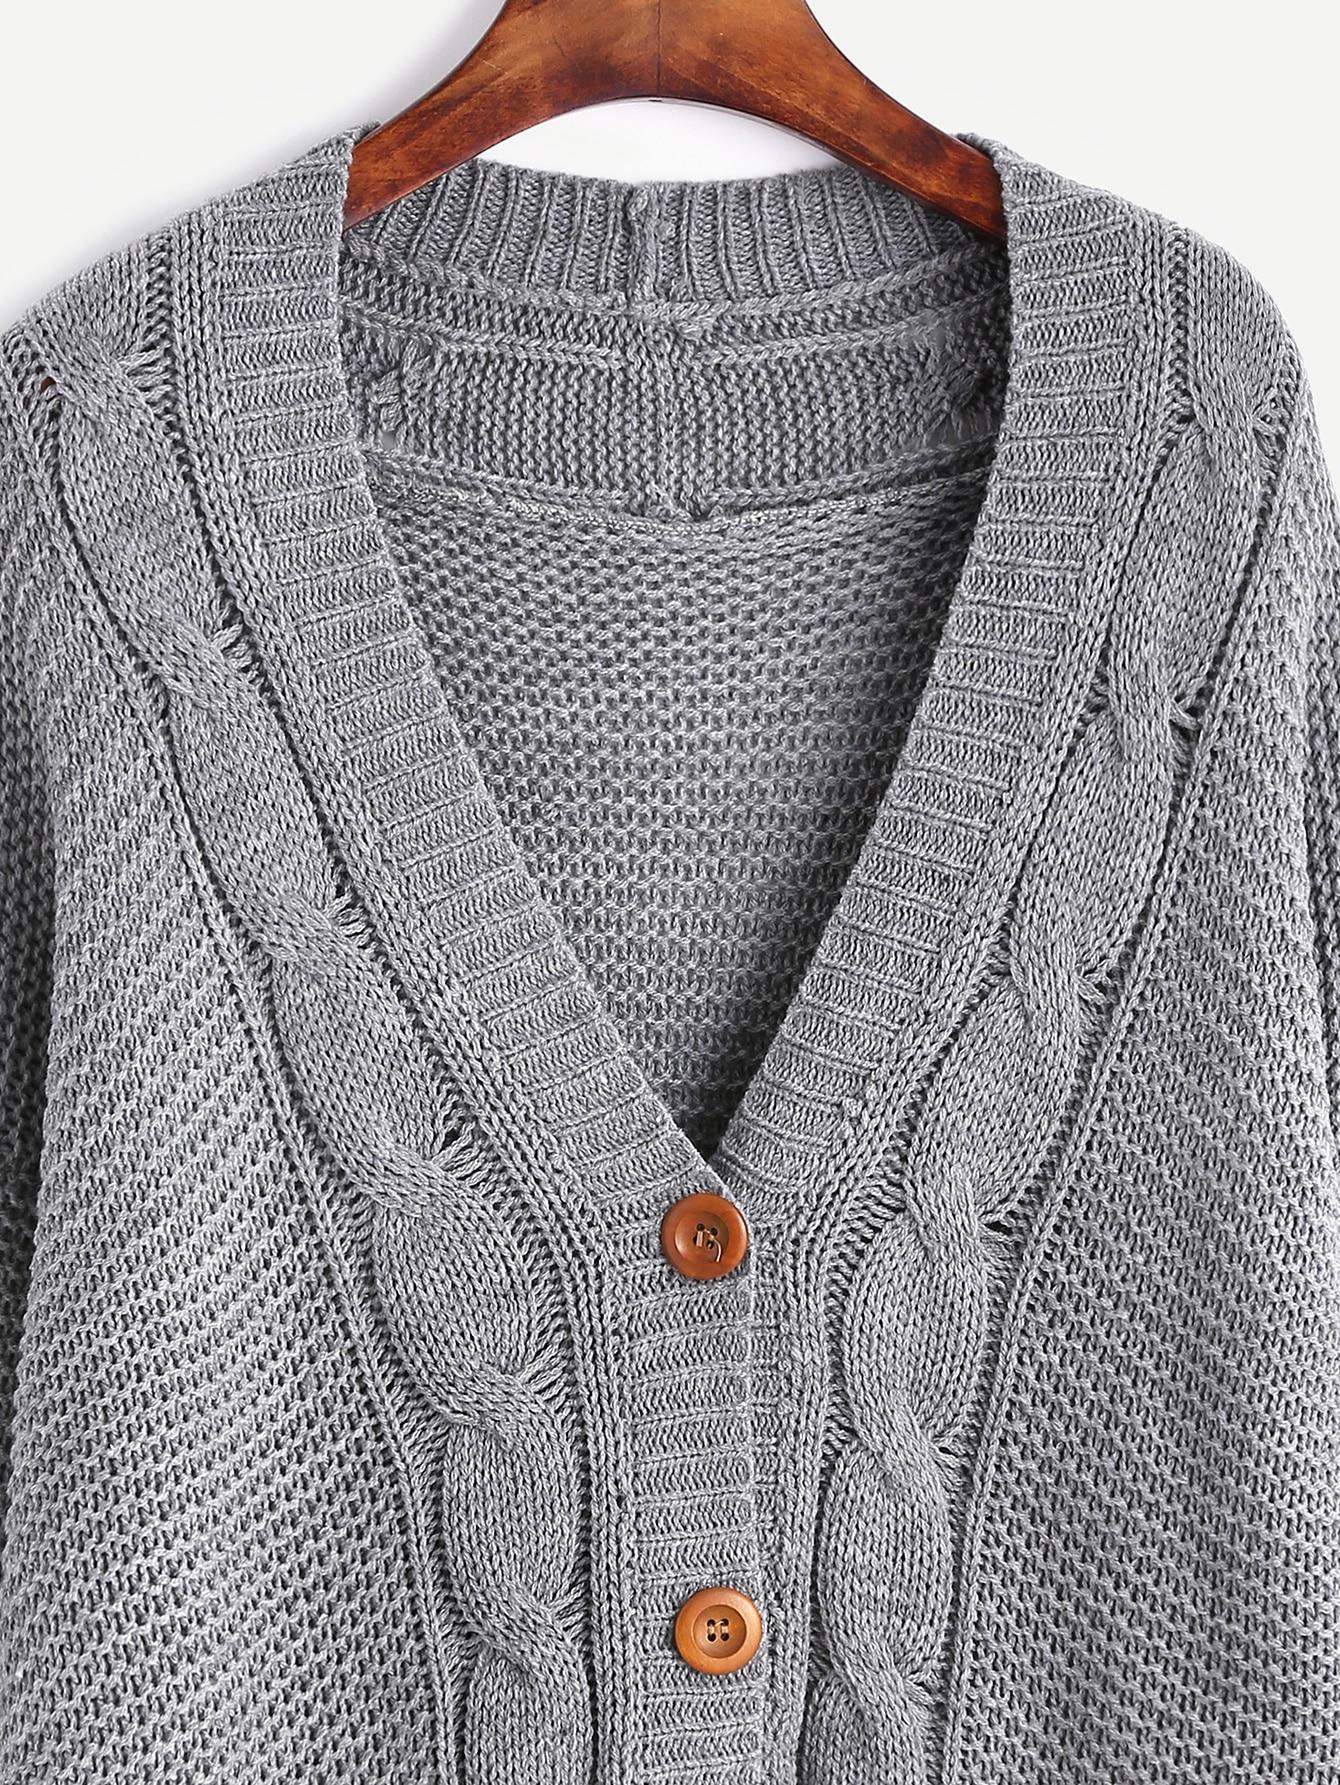 sweater161021470_2